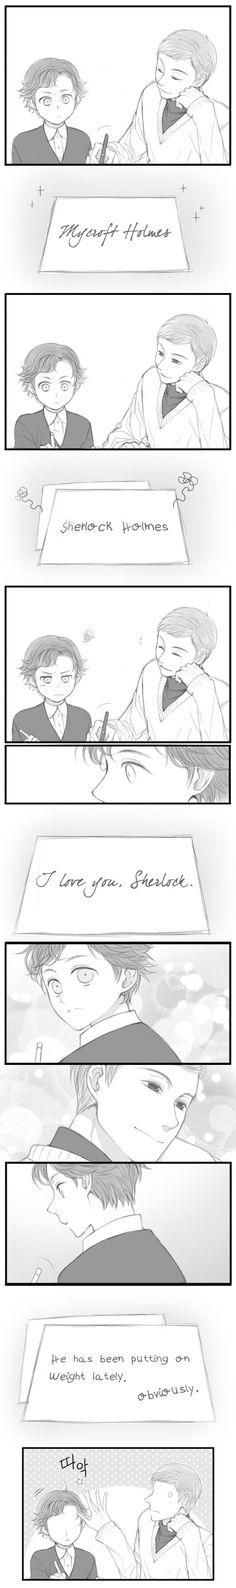 Tags: Anime, Comic, Sherlock Holmes, Sherlock Holmes (Character), Sherlock BBC